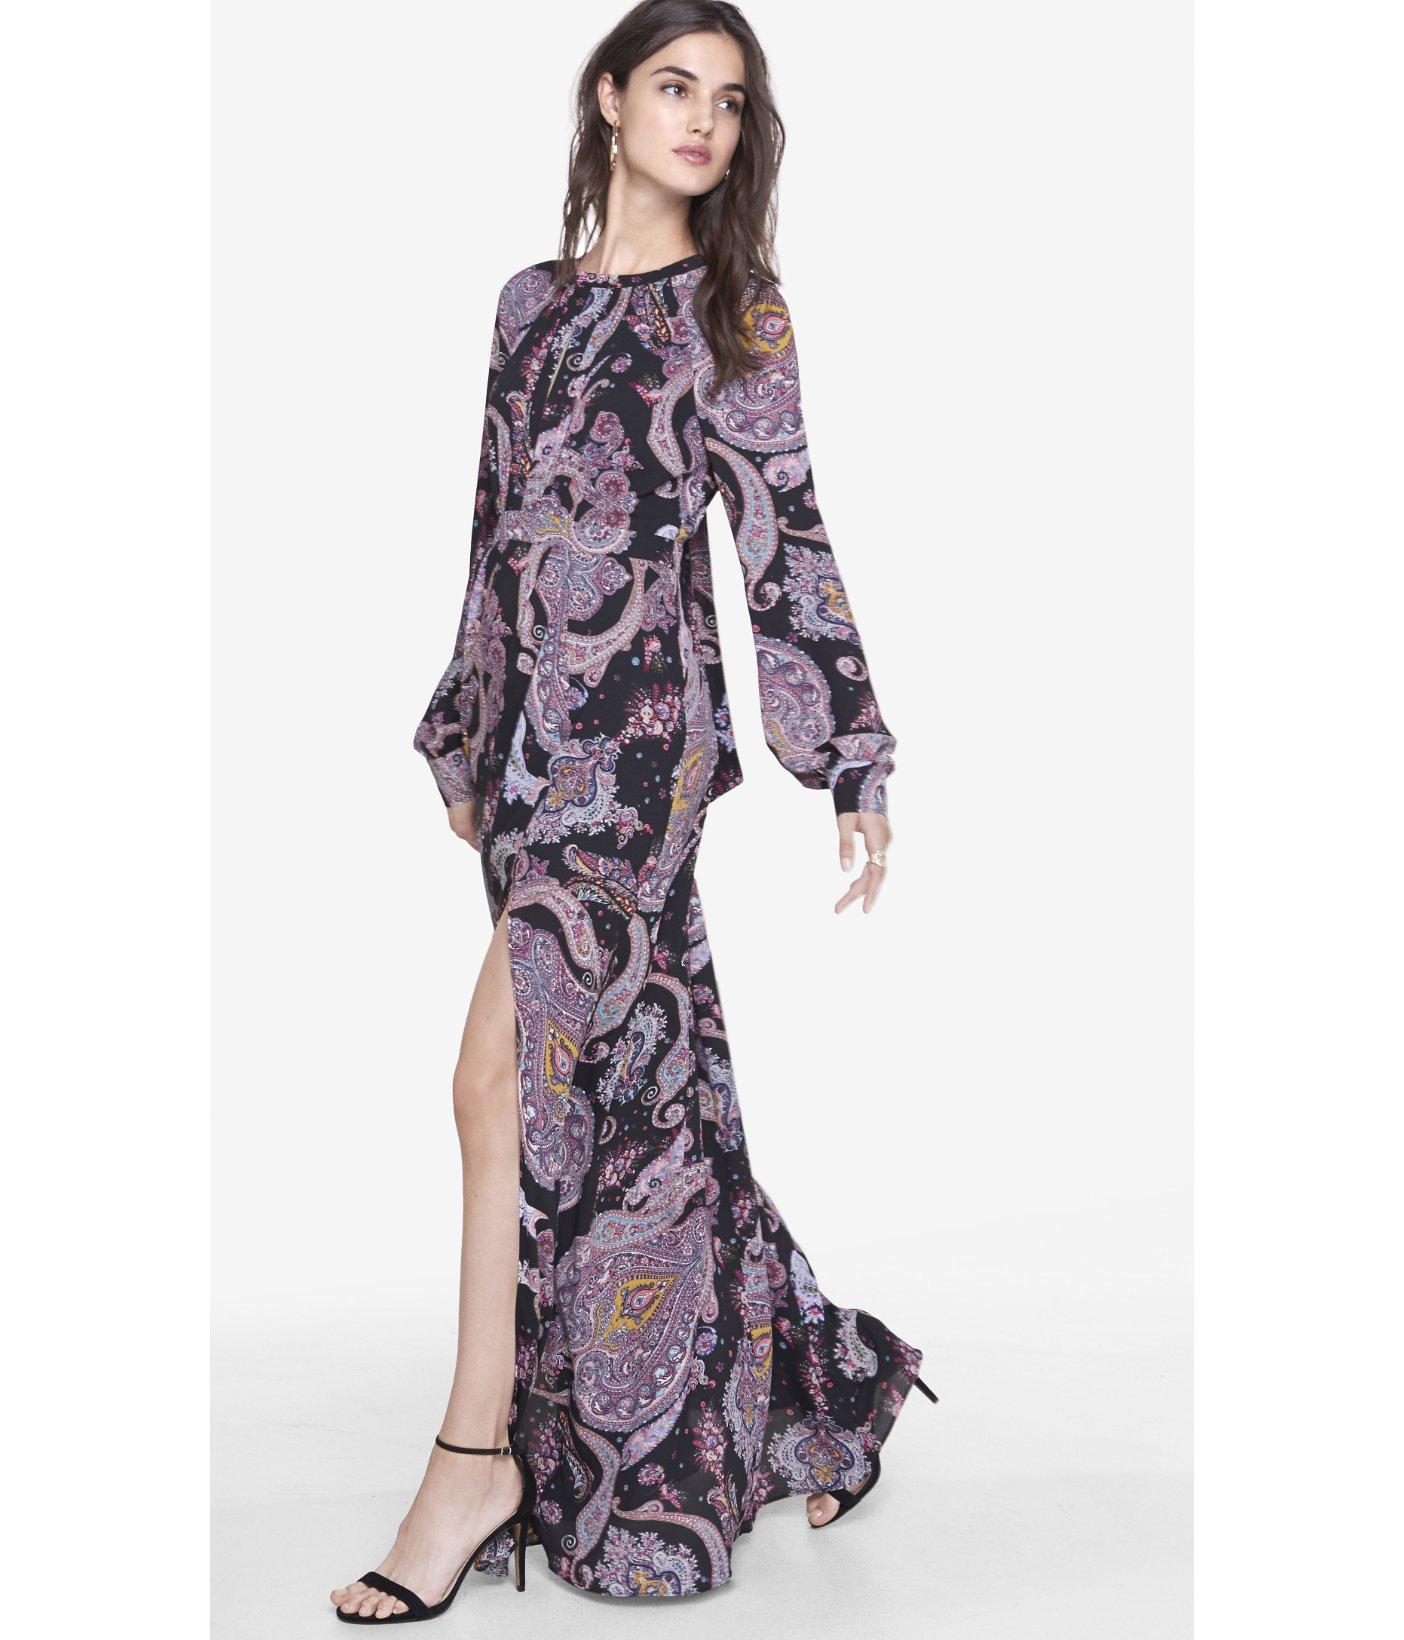 Shirred Long Sleeve Dress Express Dress On Sale